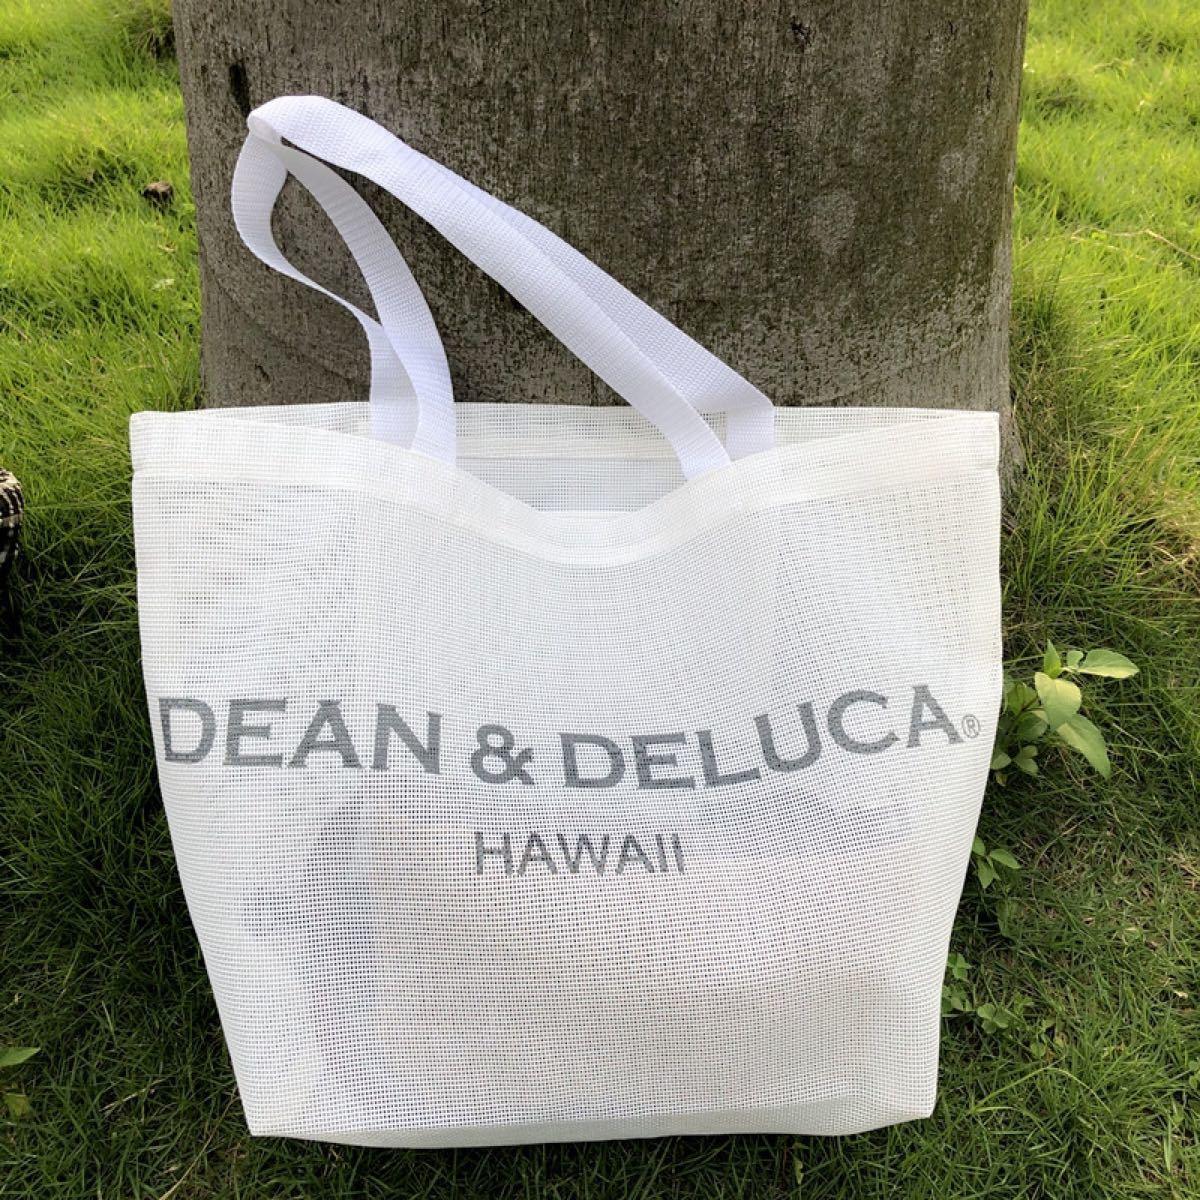 DEAN&DELUCA メッシュトートバッグ エコバッグ 新品